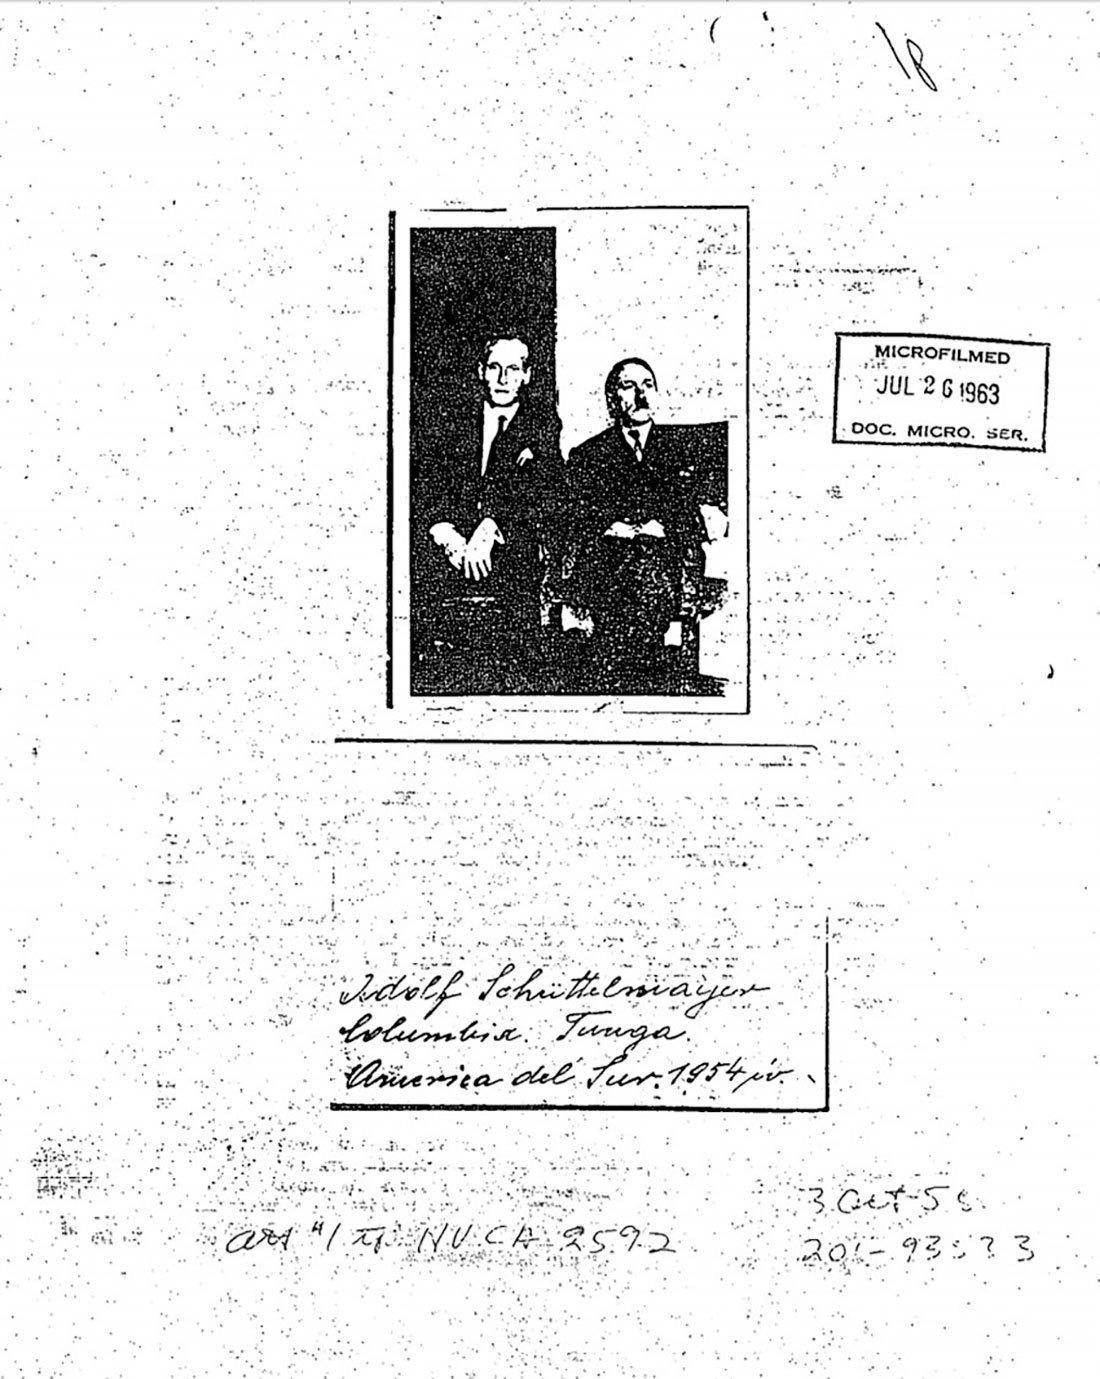 Fotografie z archivu CIA